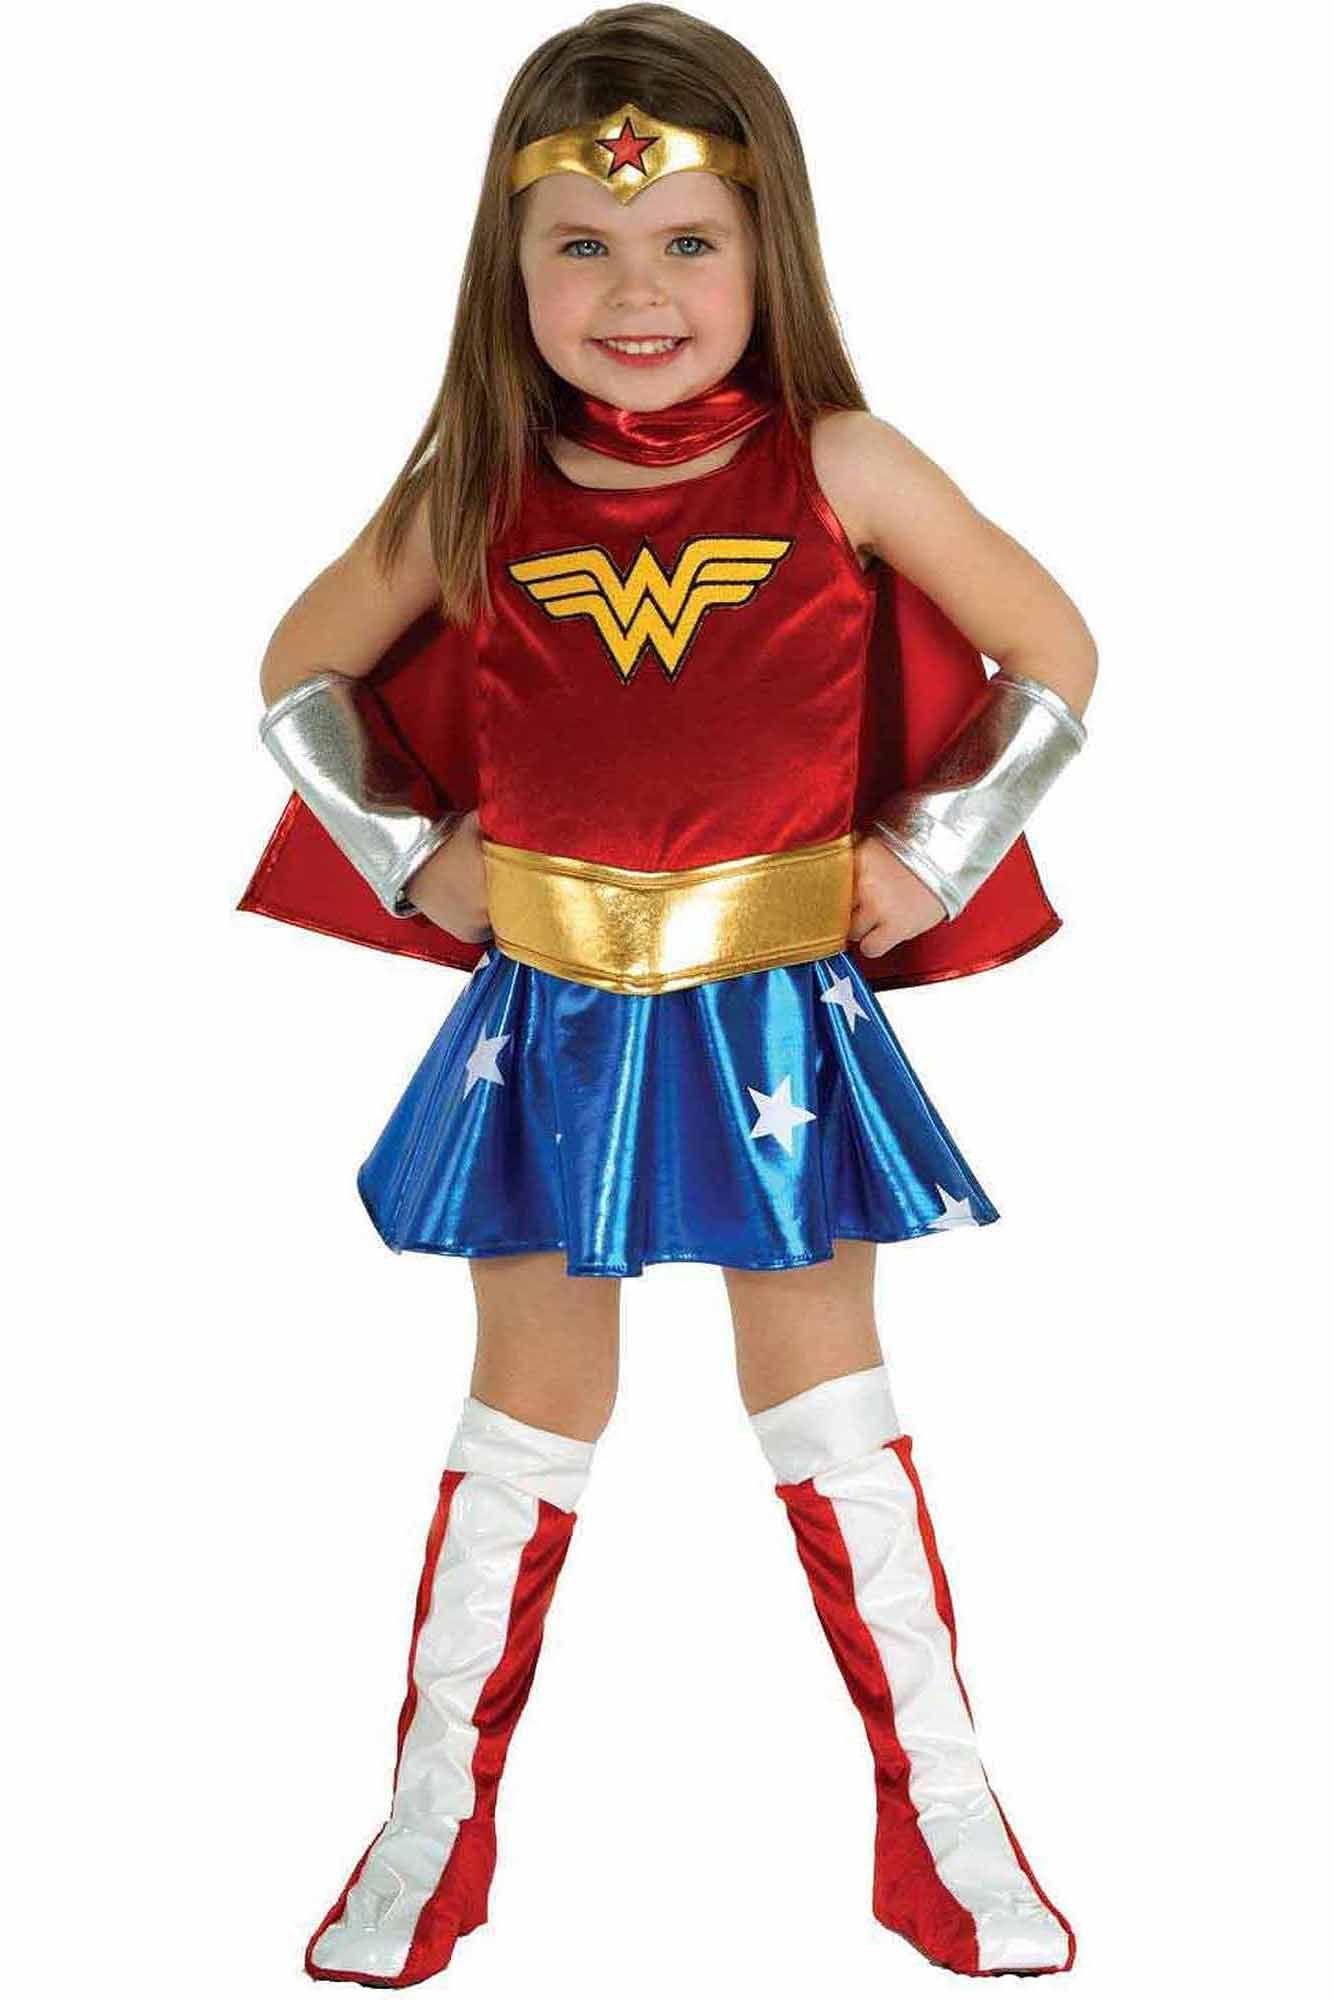 20 best toddler halloween costume ideas 2018 - cute halloween